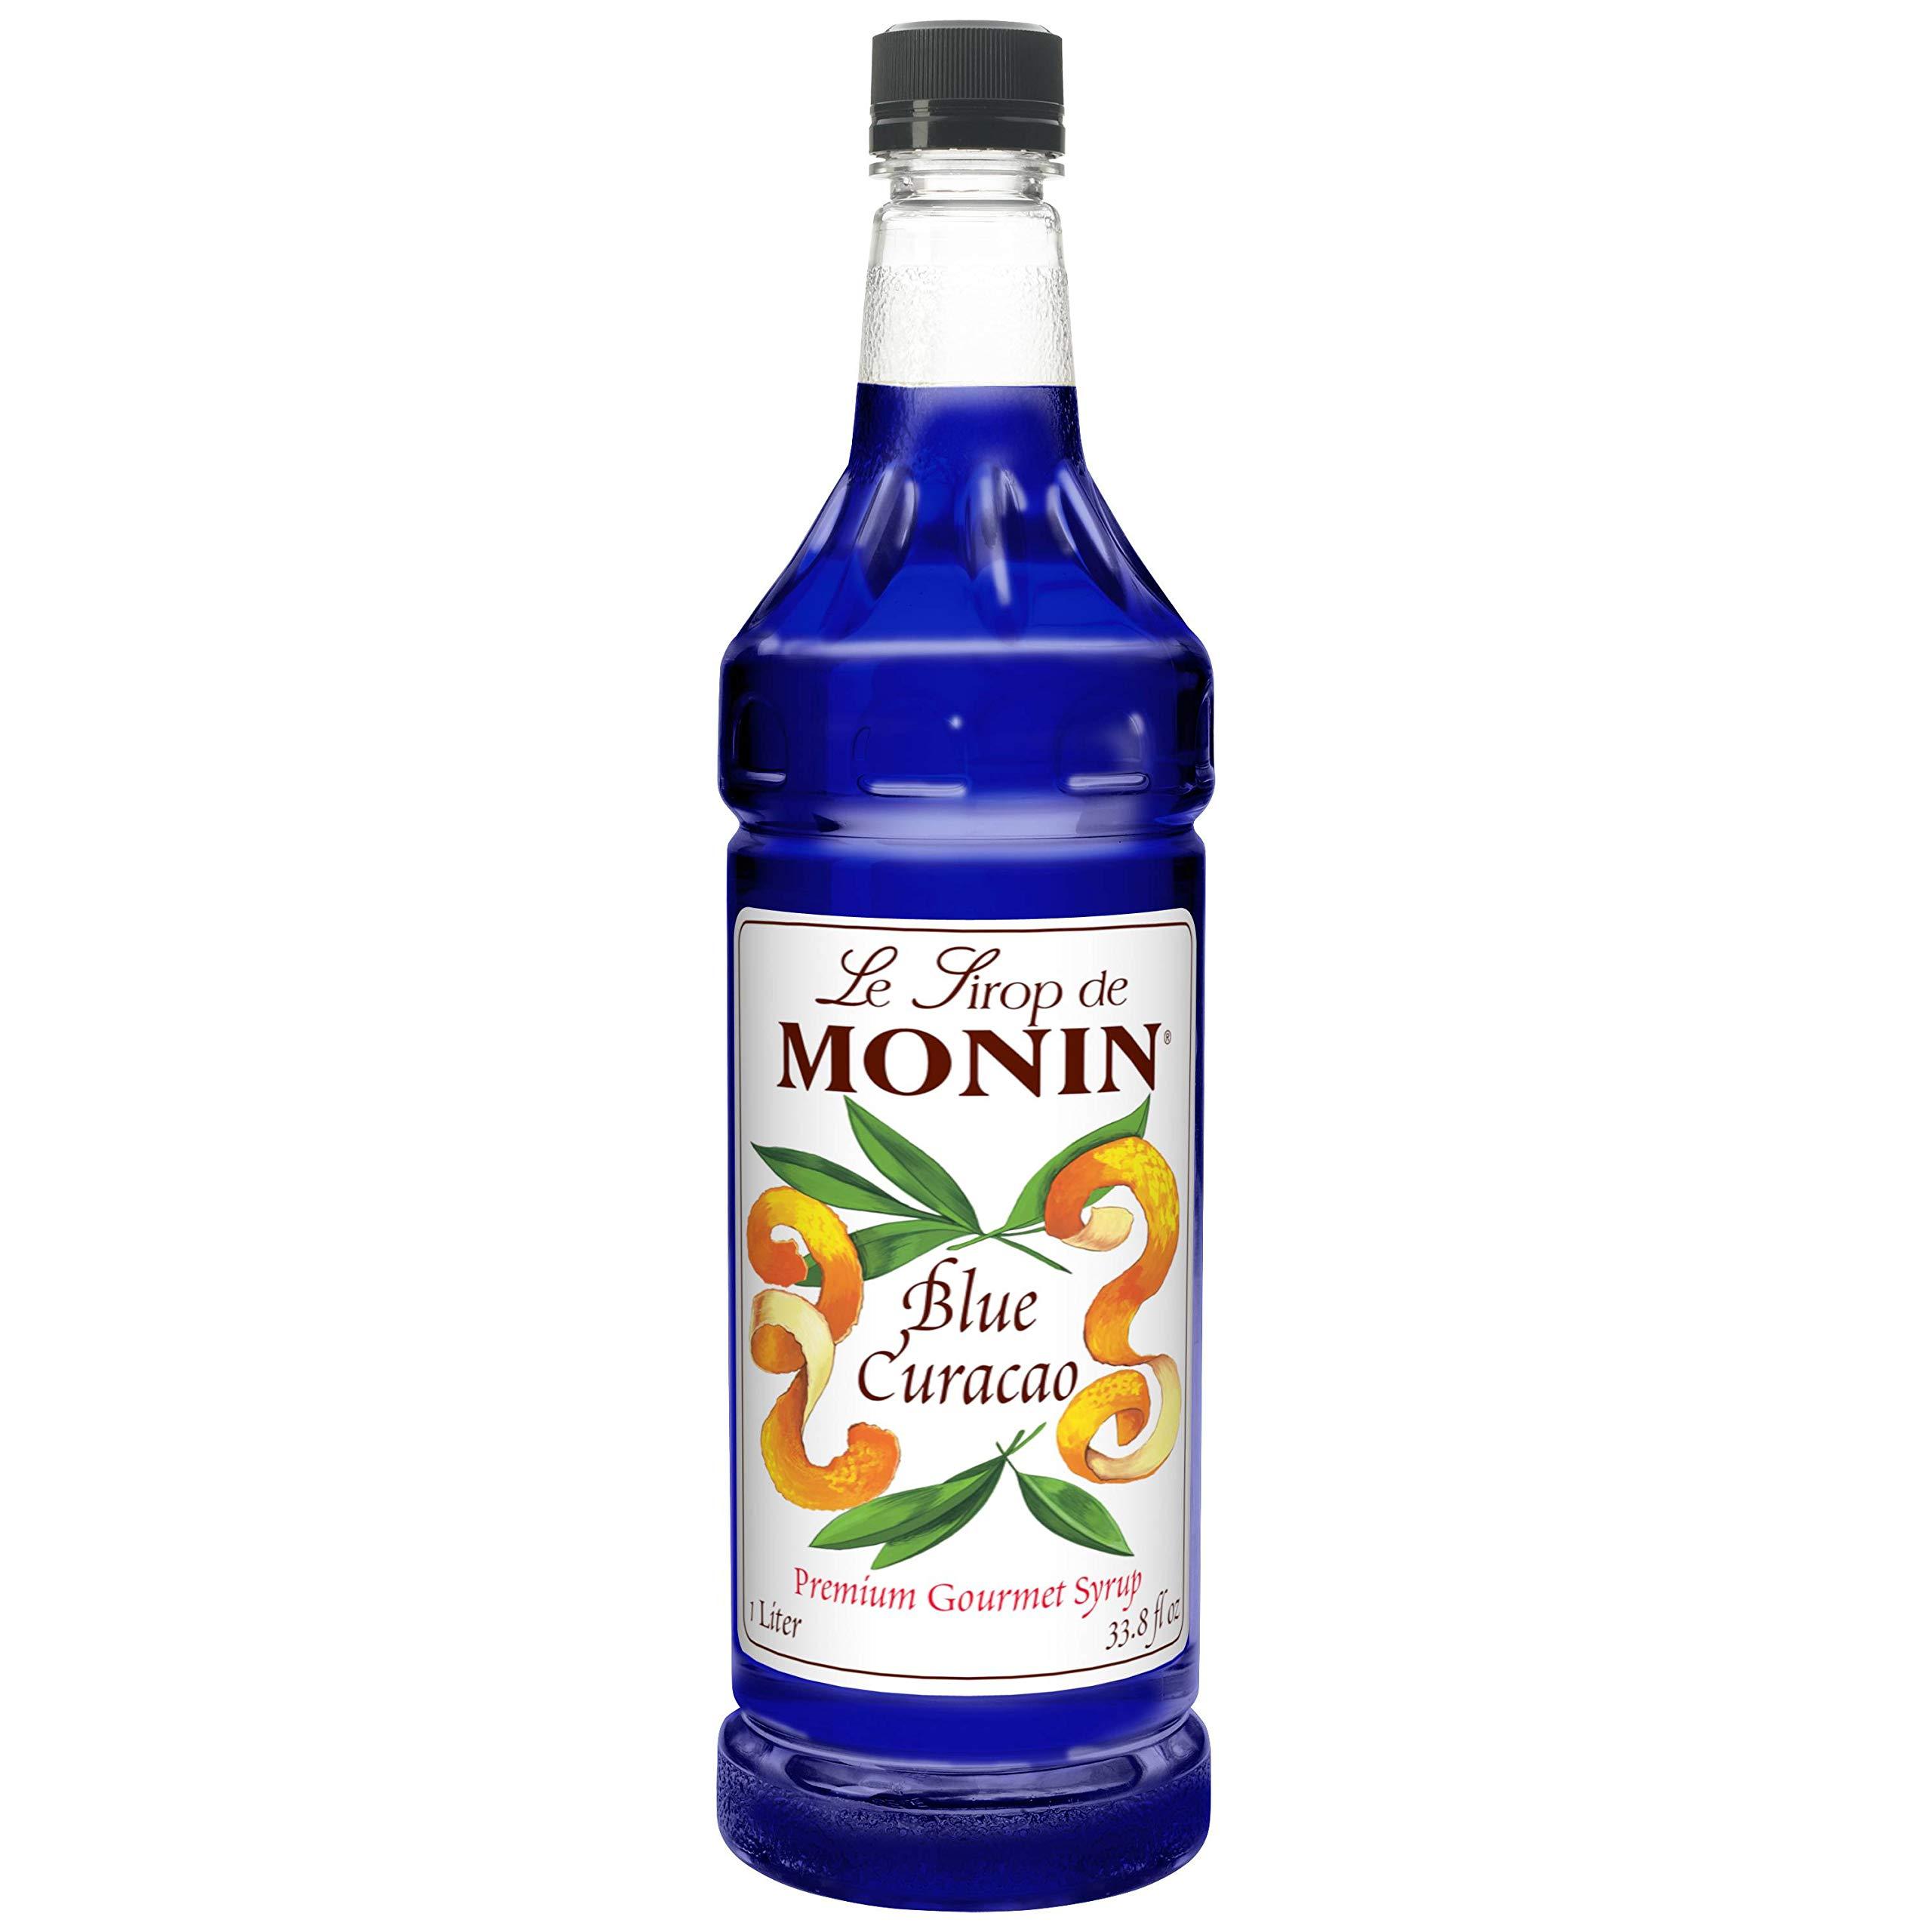 Monin Blue Curacao Flavor Syrup 1 Liter